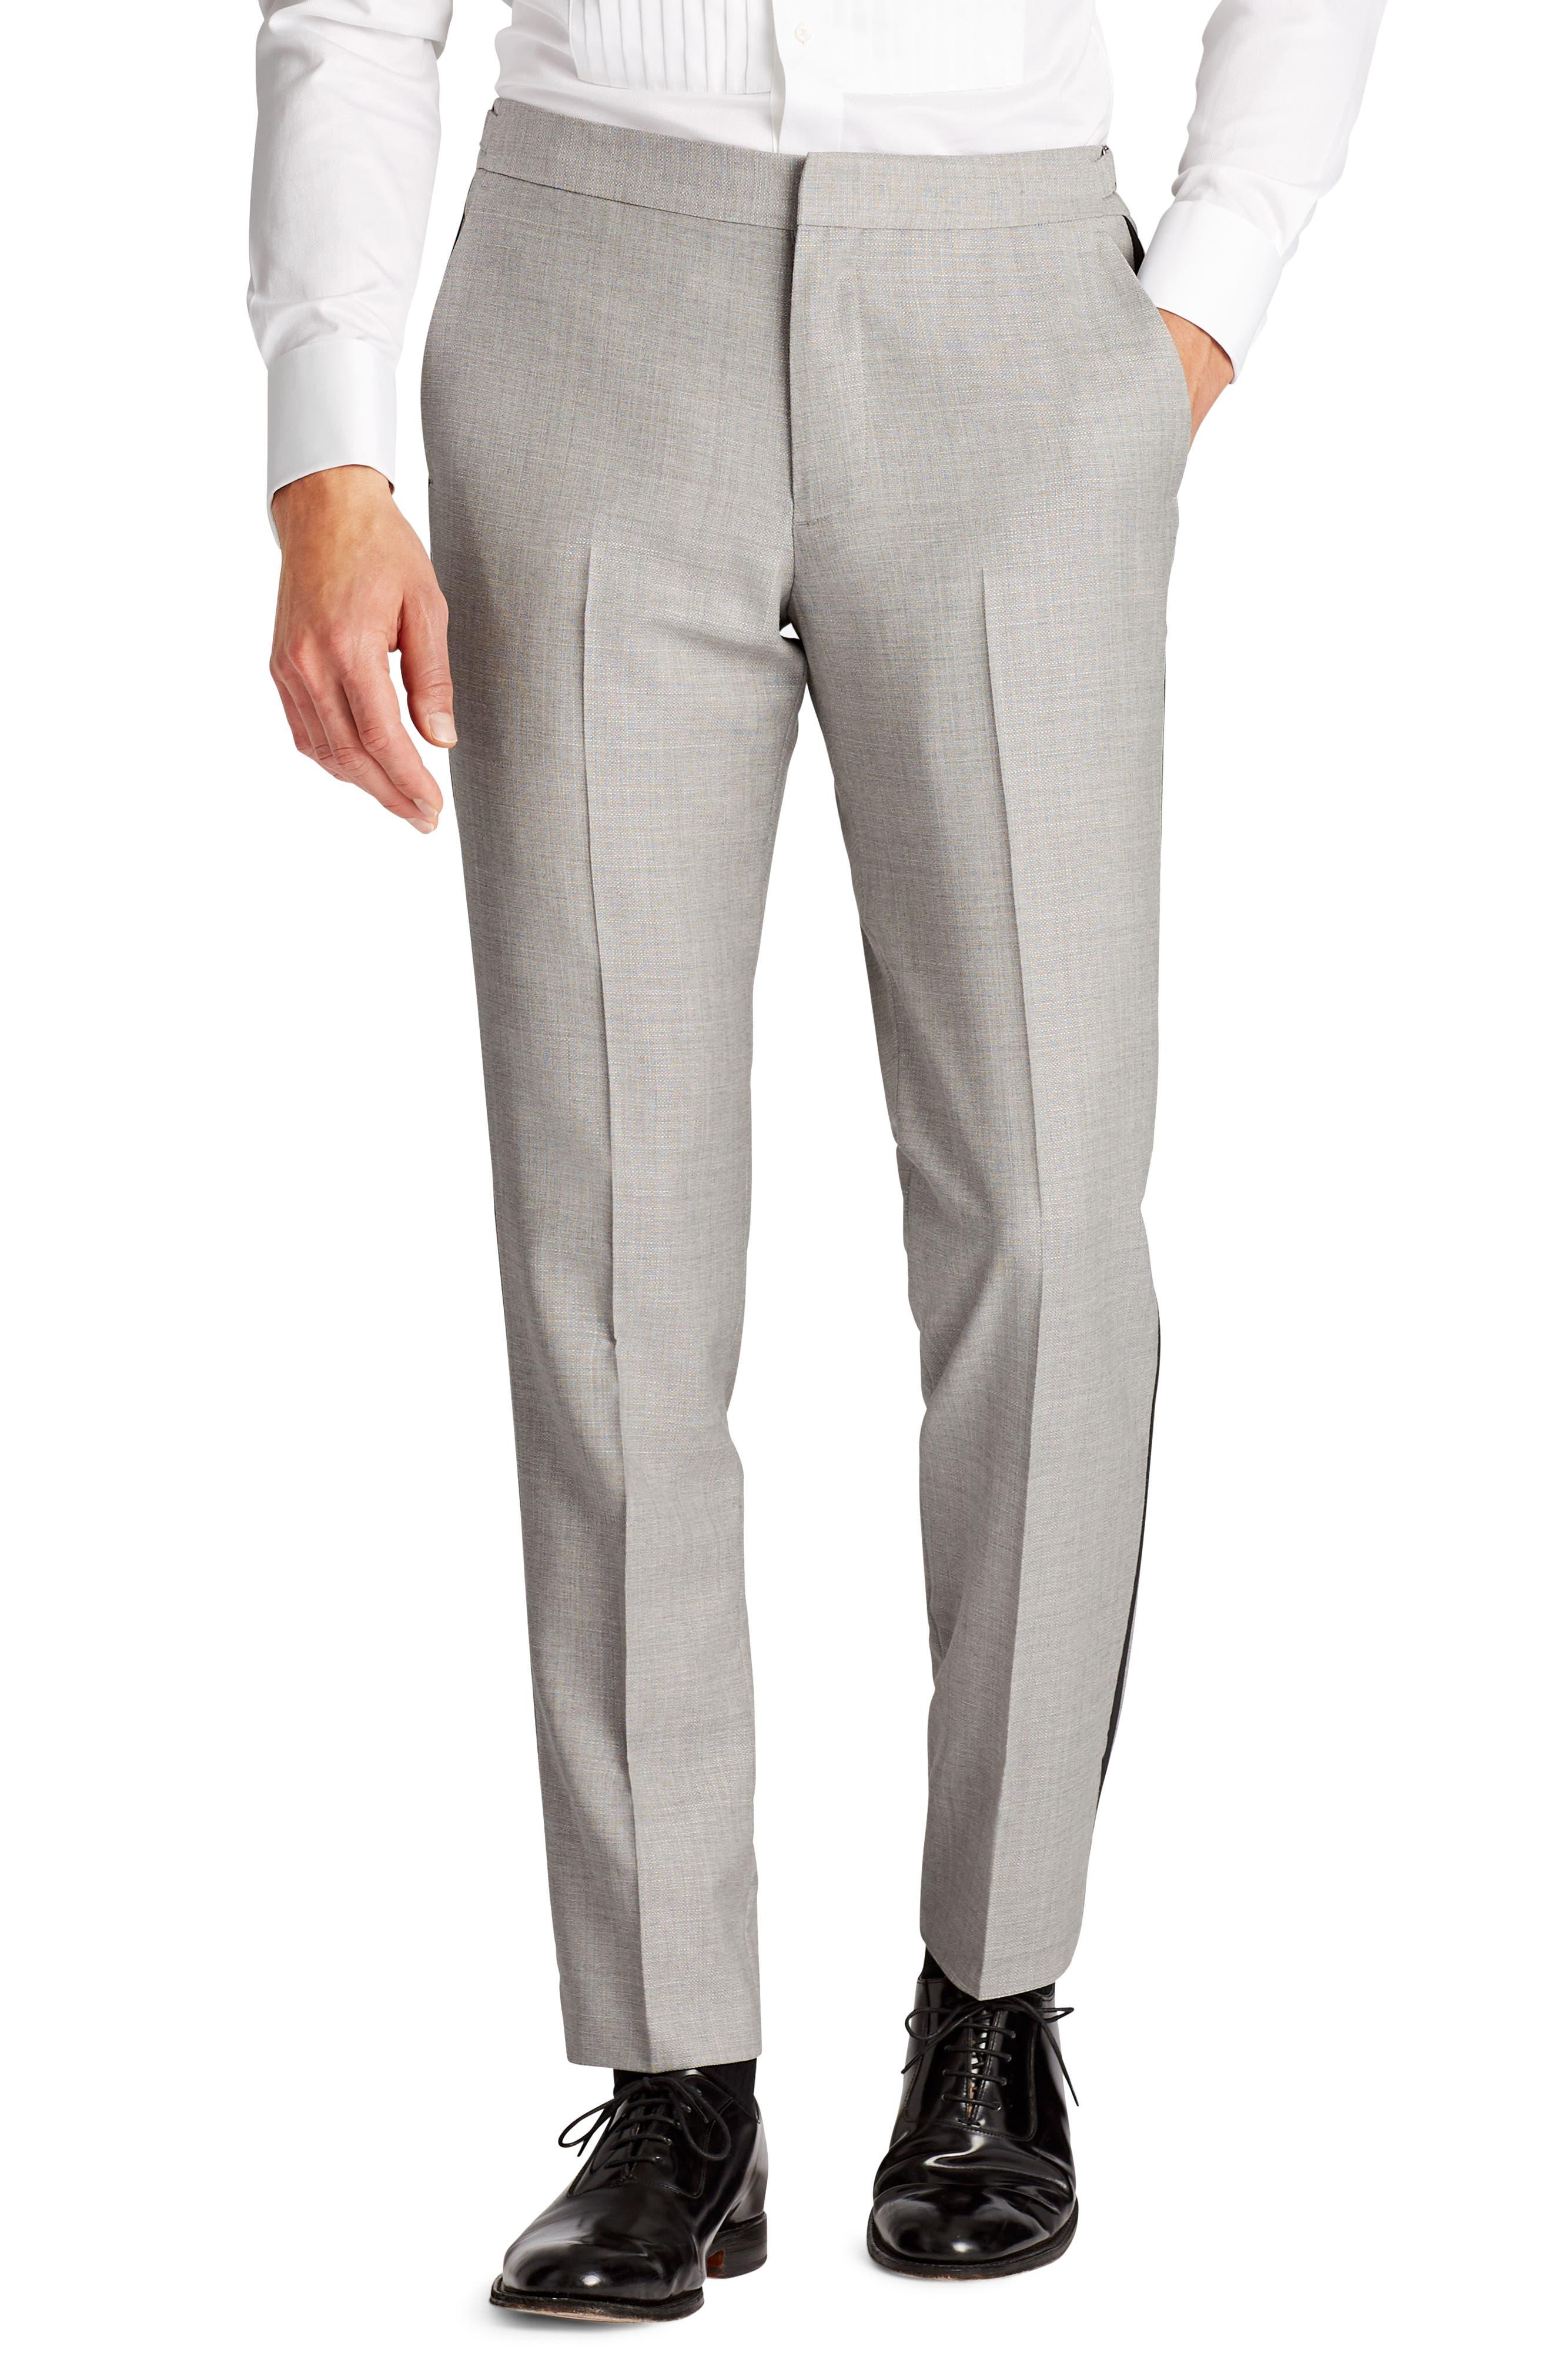 Capstone Flat Front Tuxedo Trousers,                             Main thumbnail 1, color,                             020